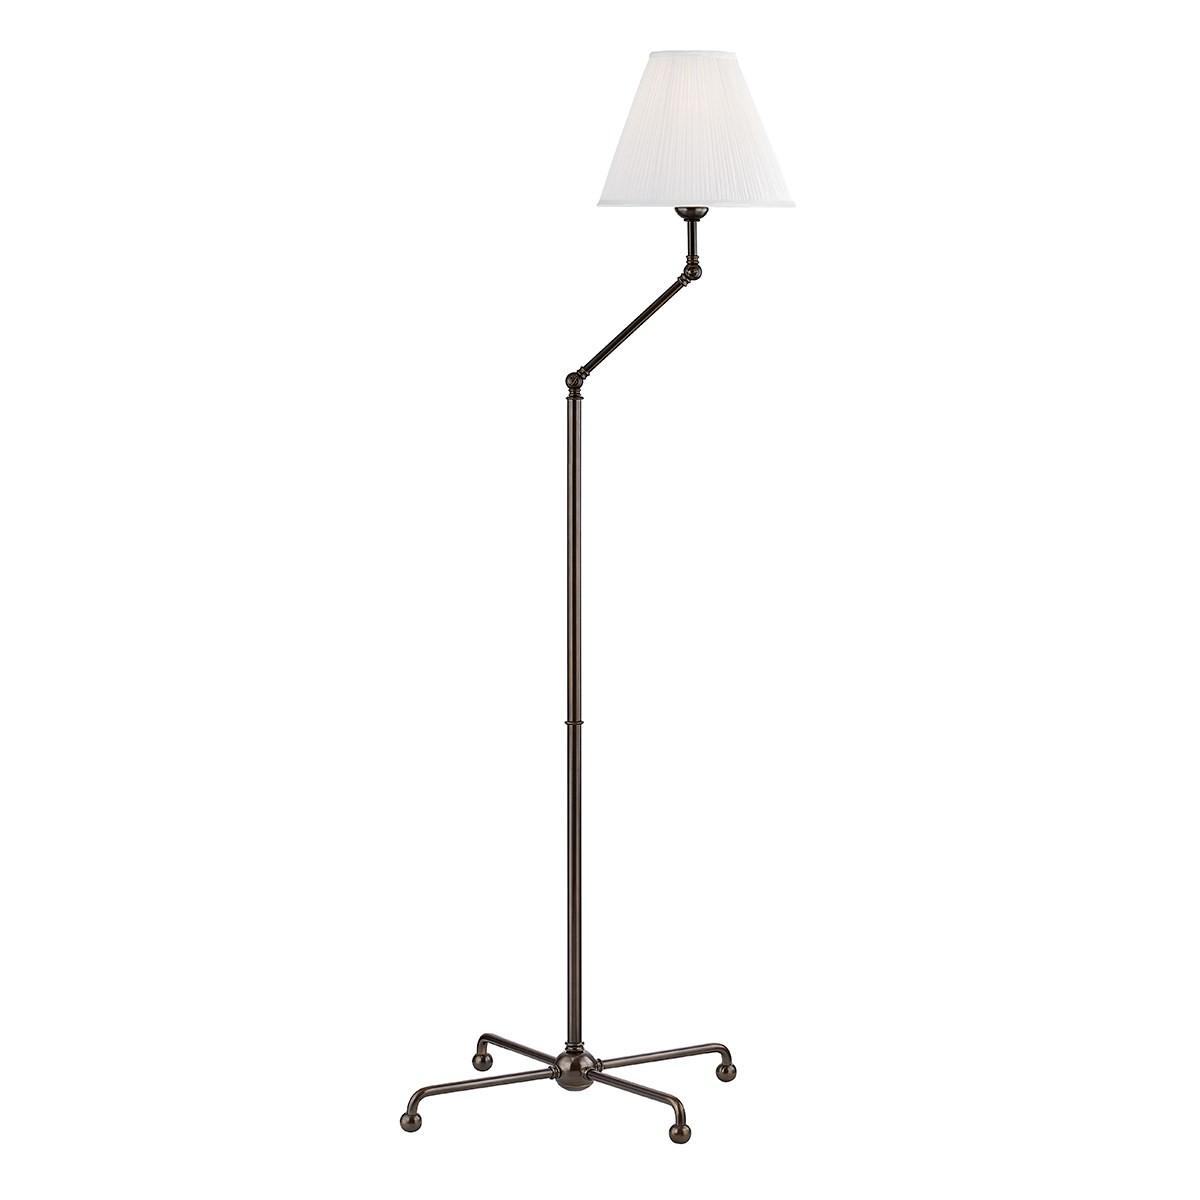 Hudson Valley I Classic No 1 Floor Lamp I Distressed Bronze